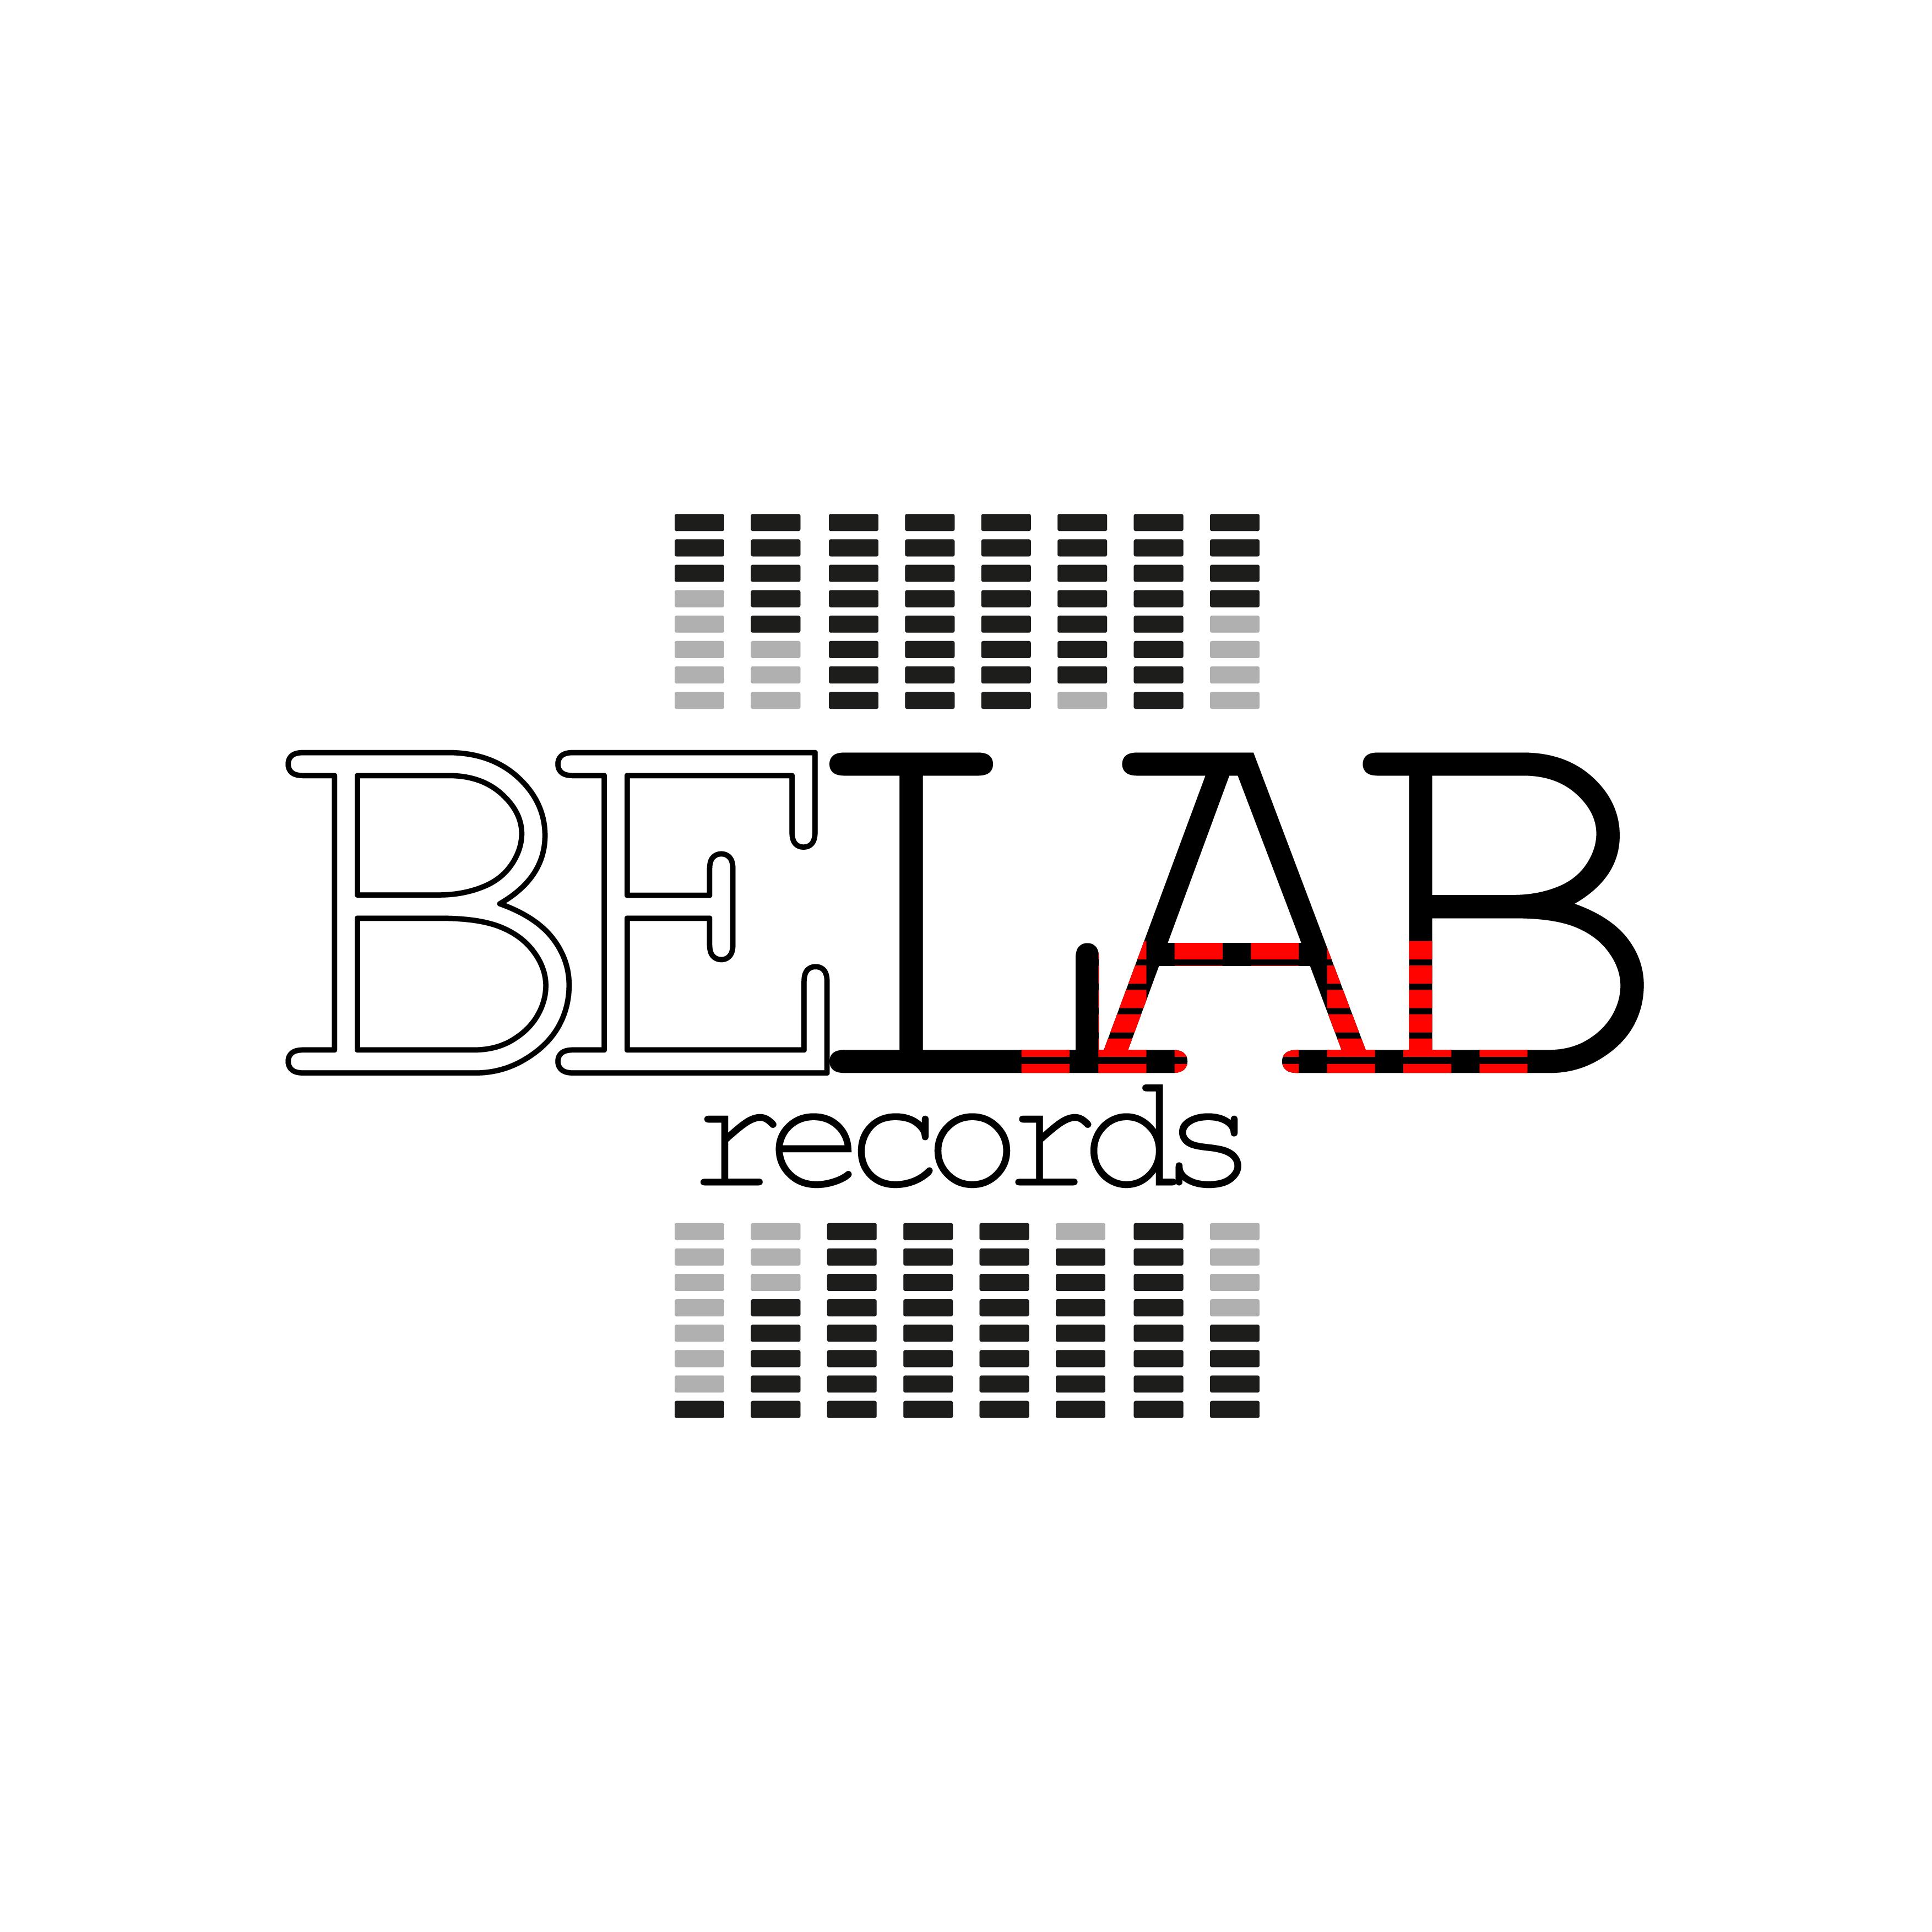 Belab Records